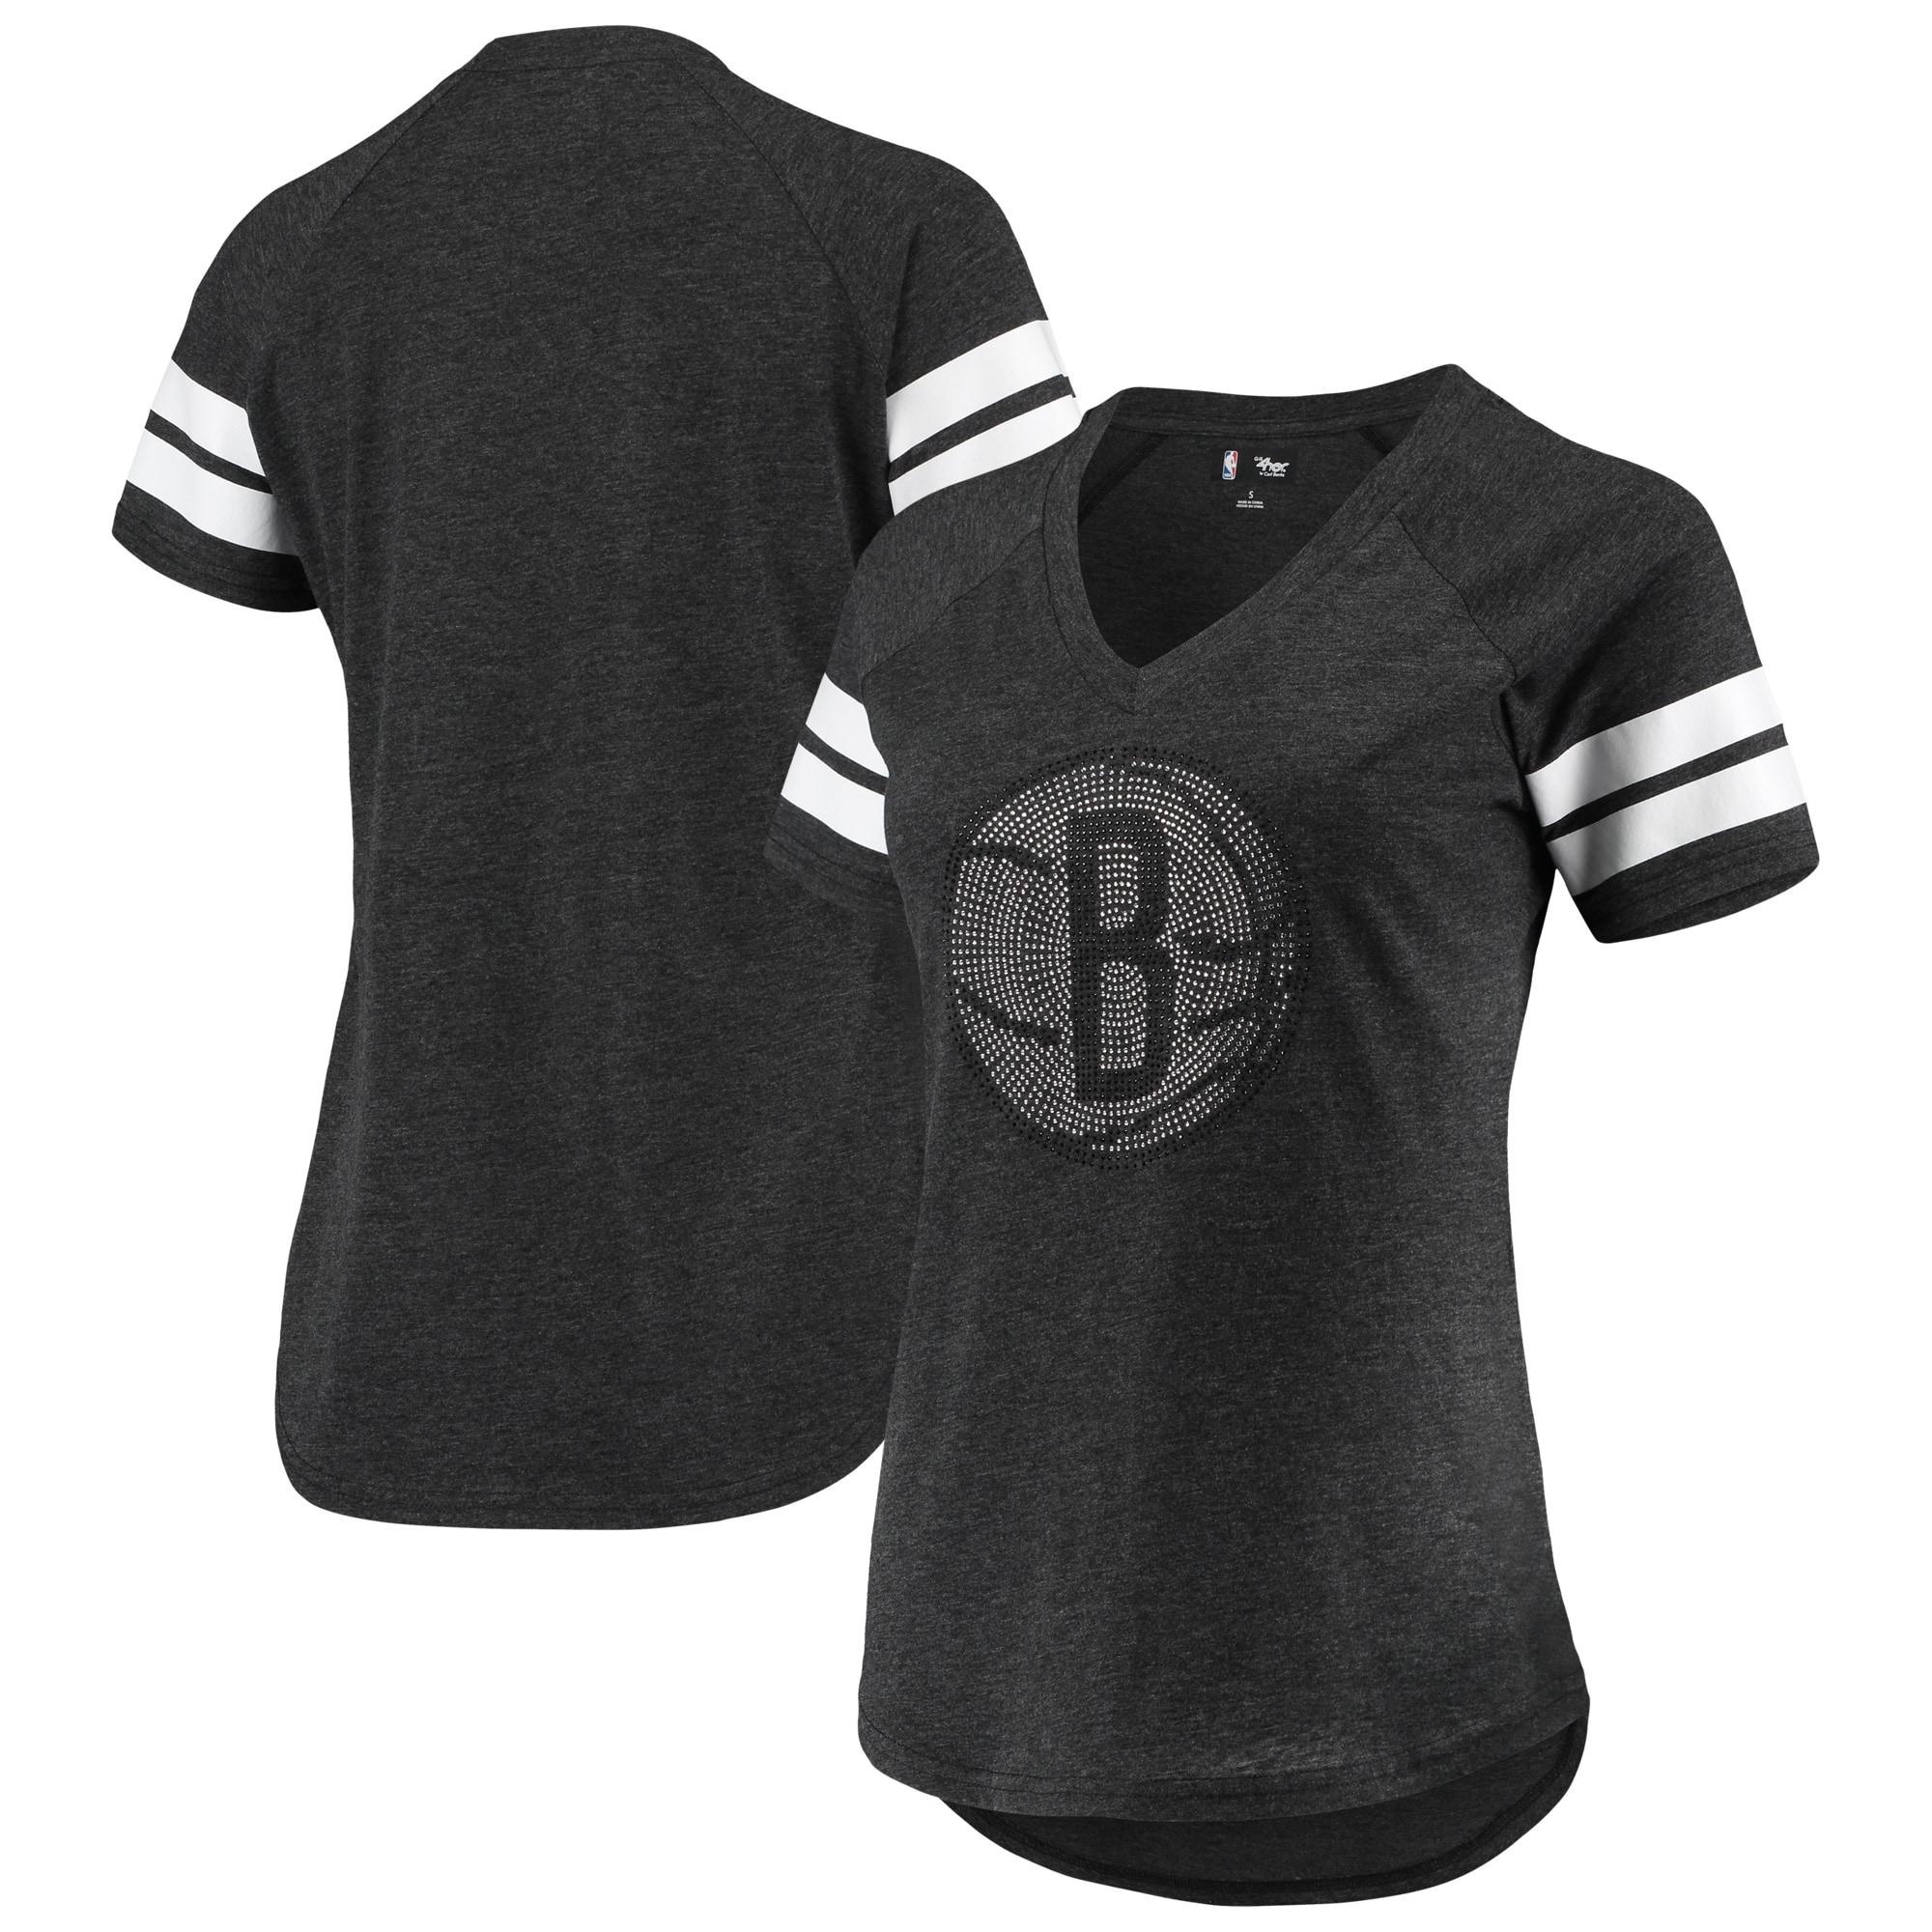 Brooklyn Nets G-III 4Her by Carl Banks Women's Triple Double Rhinestone Tri-Blend V-Neck T-Shirt - Black